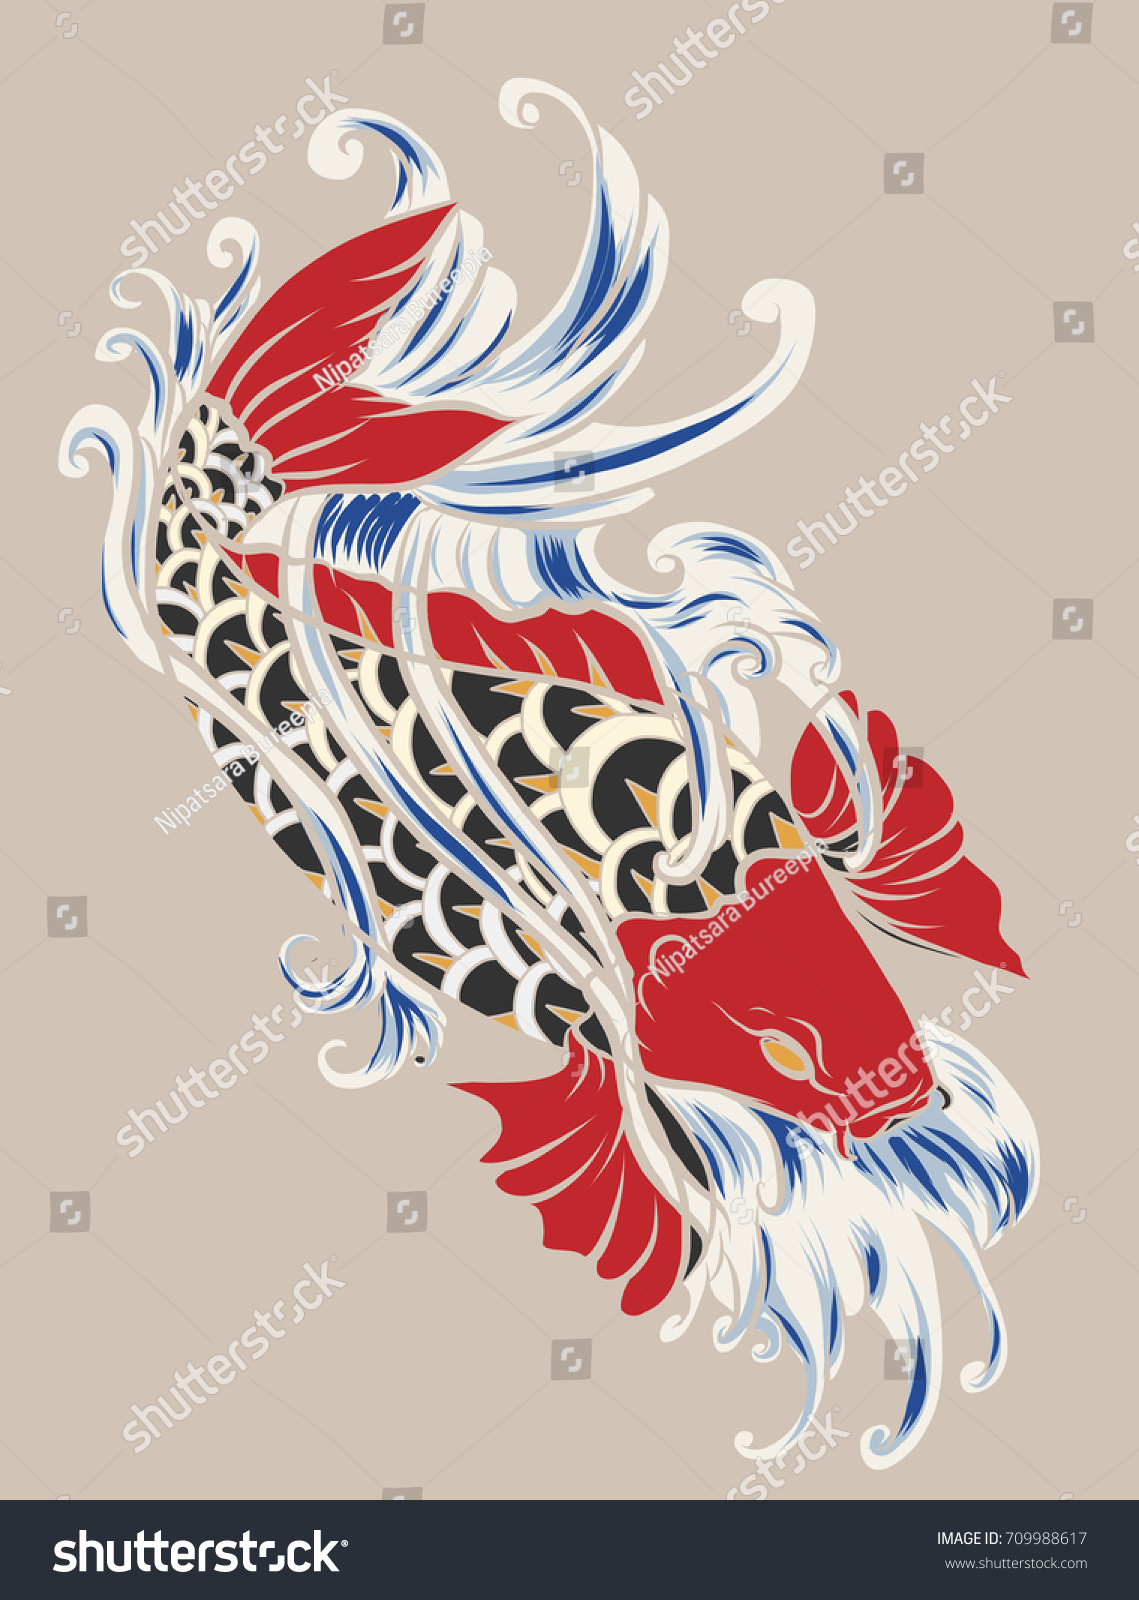 Hand Drawn Colorful Koi Fish Water Stock Vector 709988617 - Shutterstock